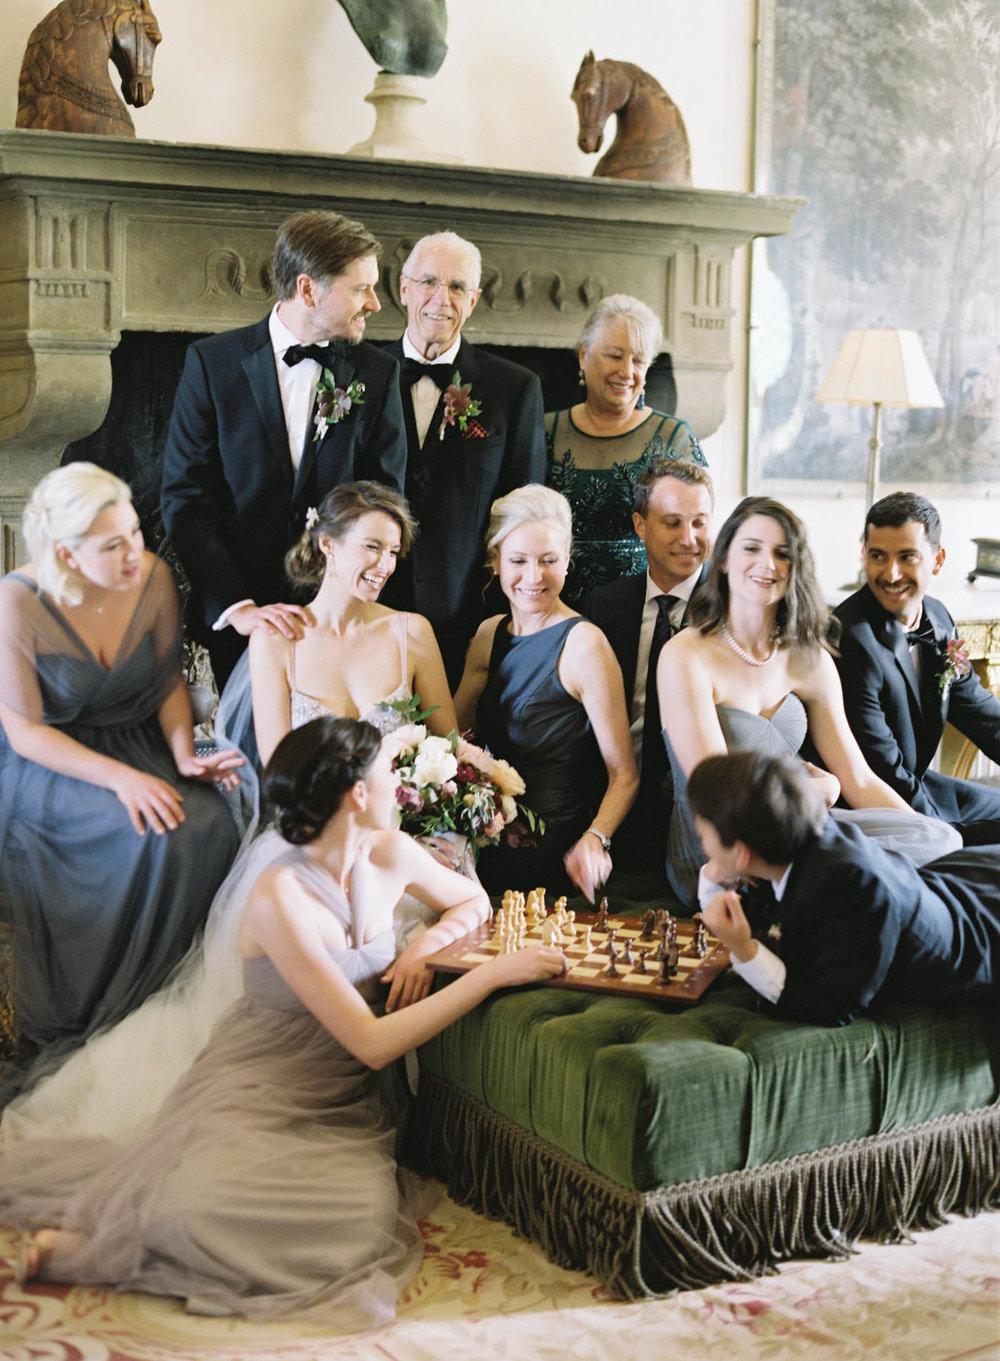 Villa_Cetinale_Wedding-27-Jen_Huang-ElanJacob-197-Jen_Huang-007299-R1-011.jpg